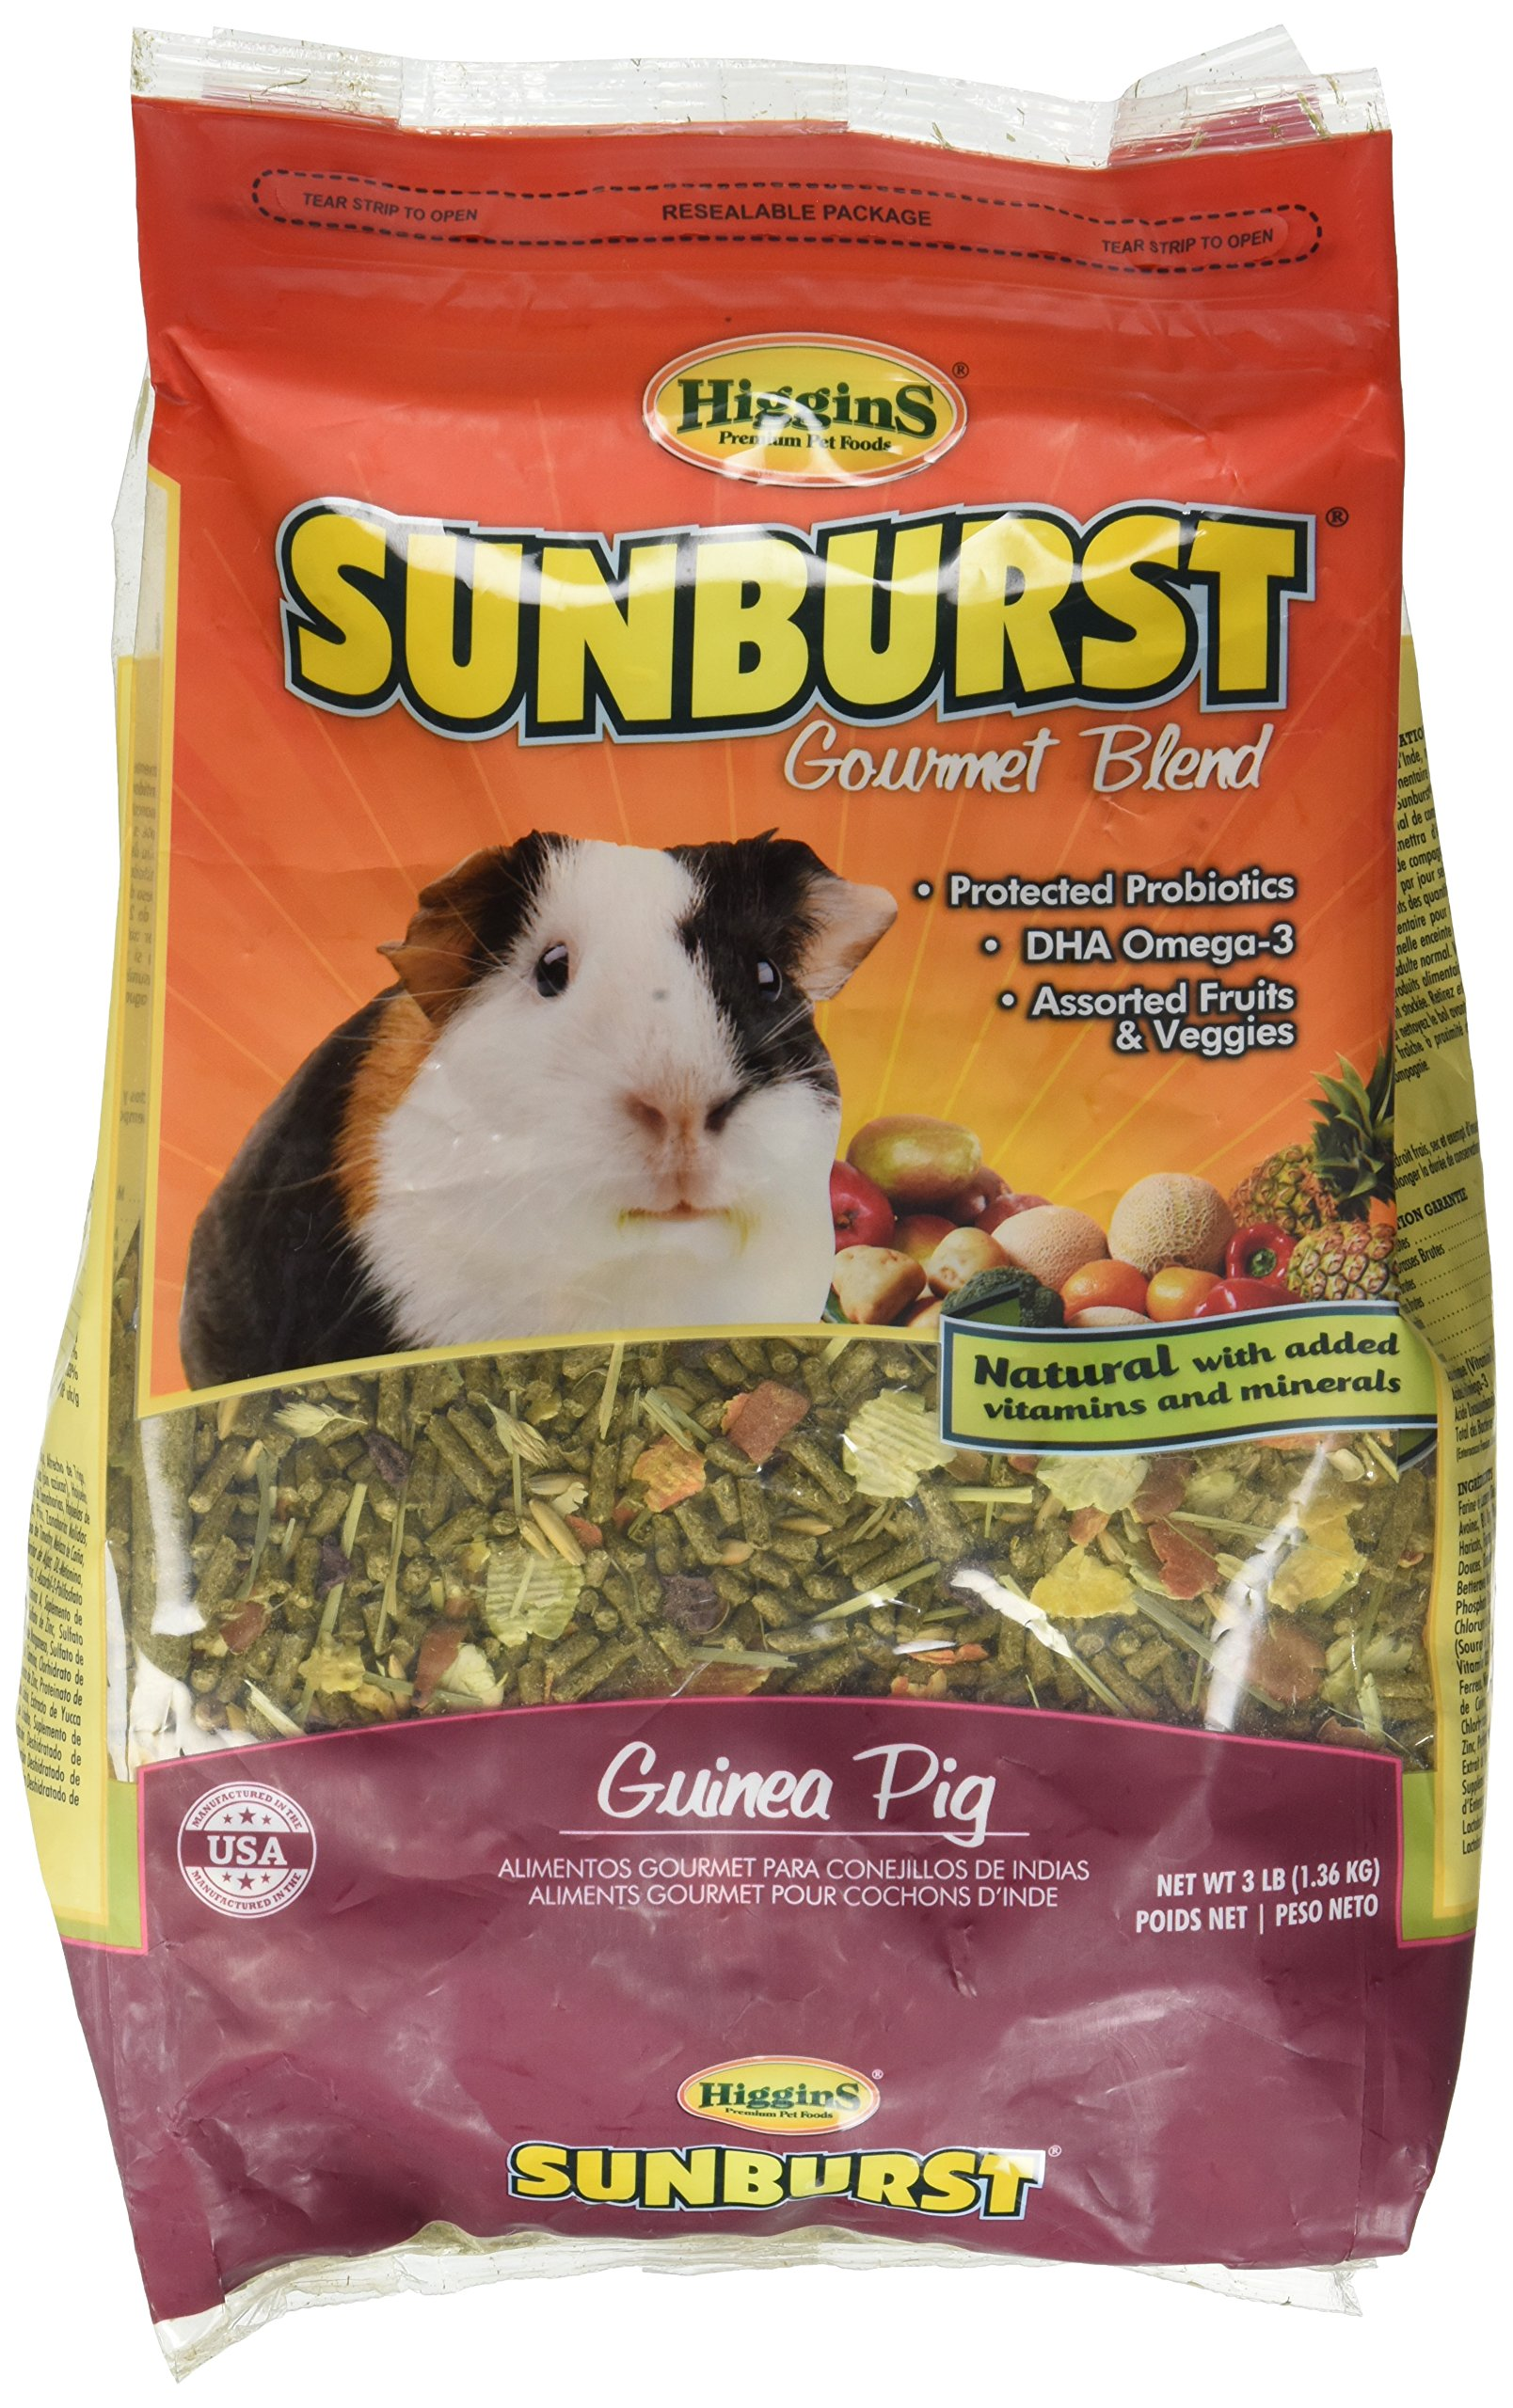 Higgins Sunburst Gourmet Food Mix for Guinea Pigs, 3 Pound